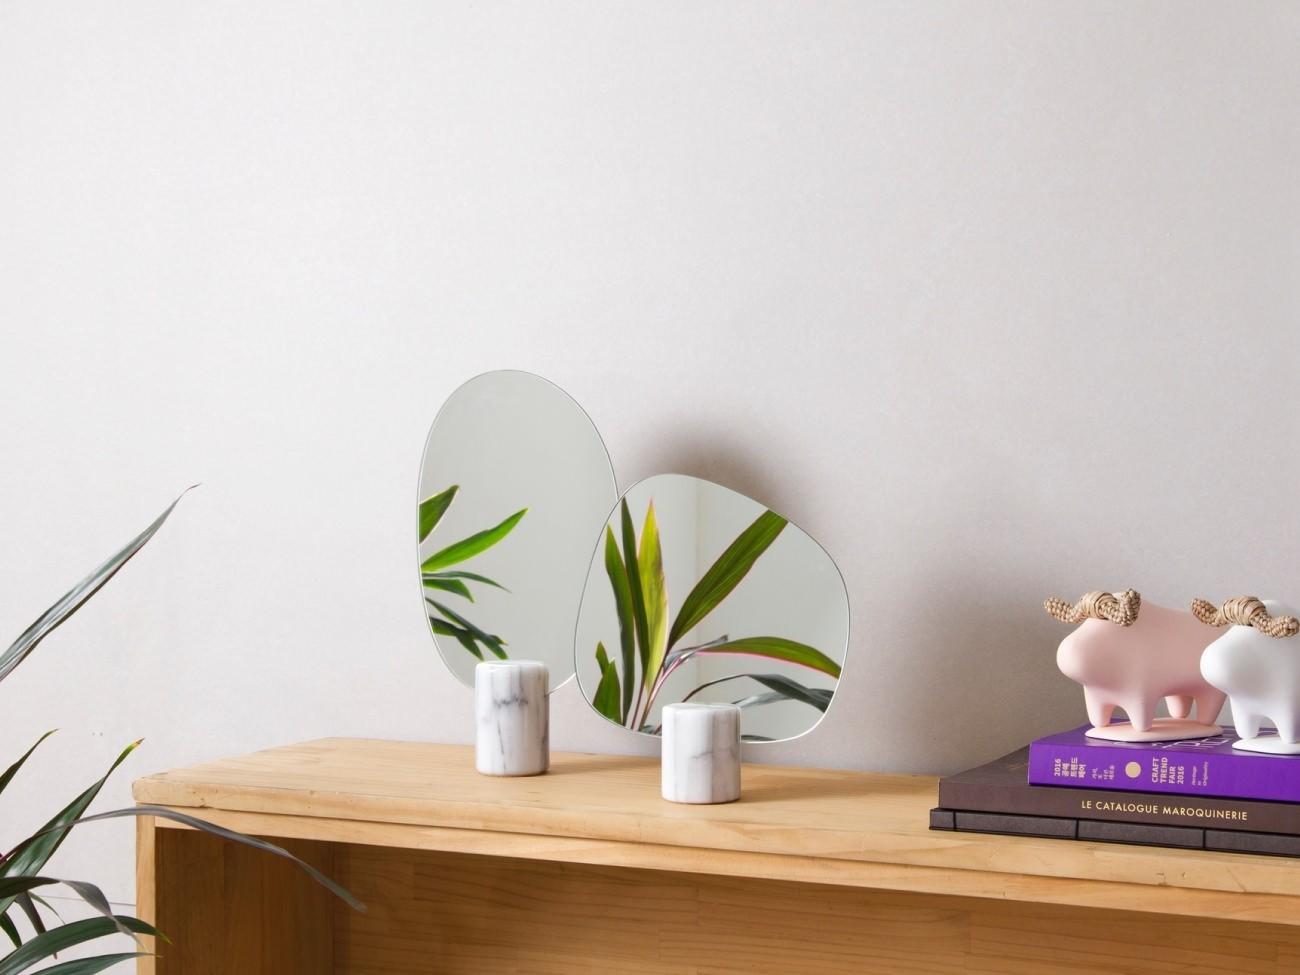 mirror-forest-set_4_mini.jpg